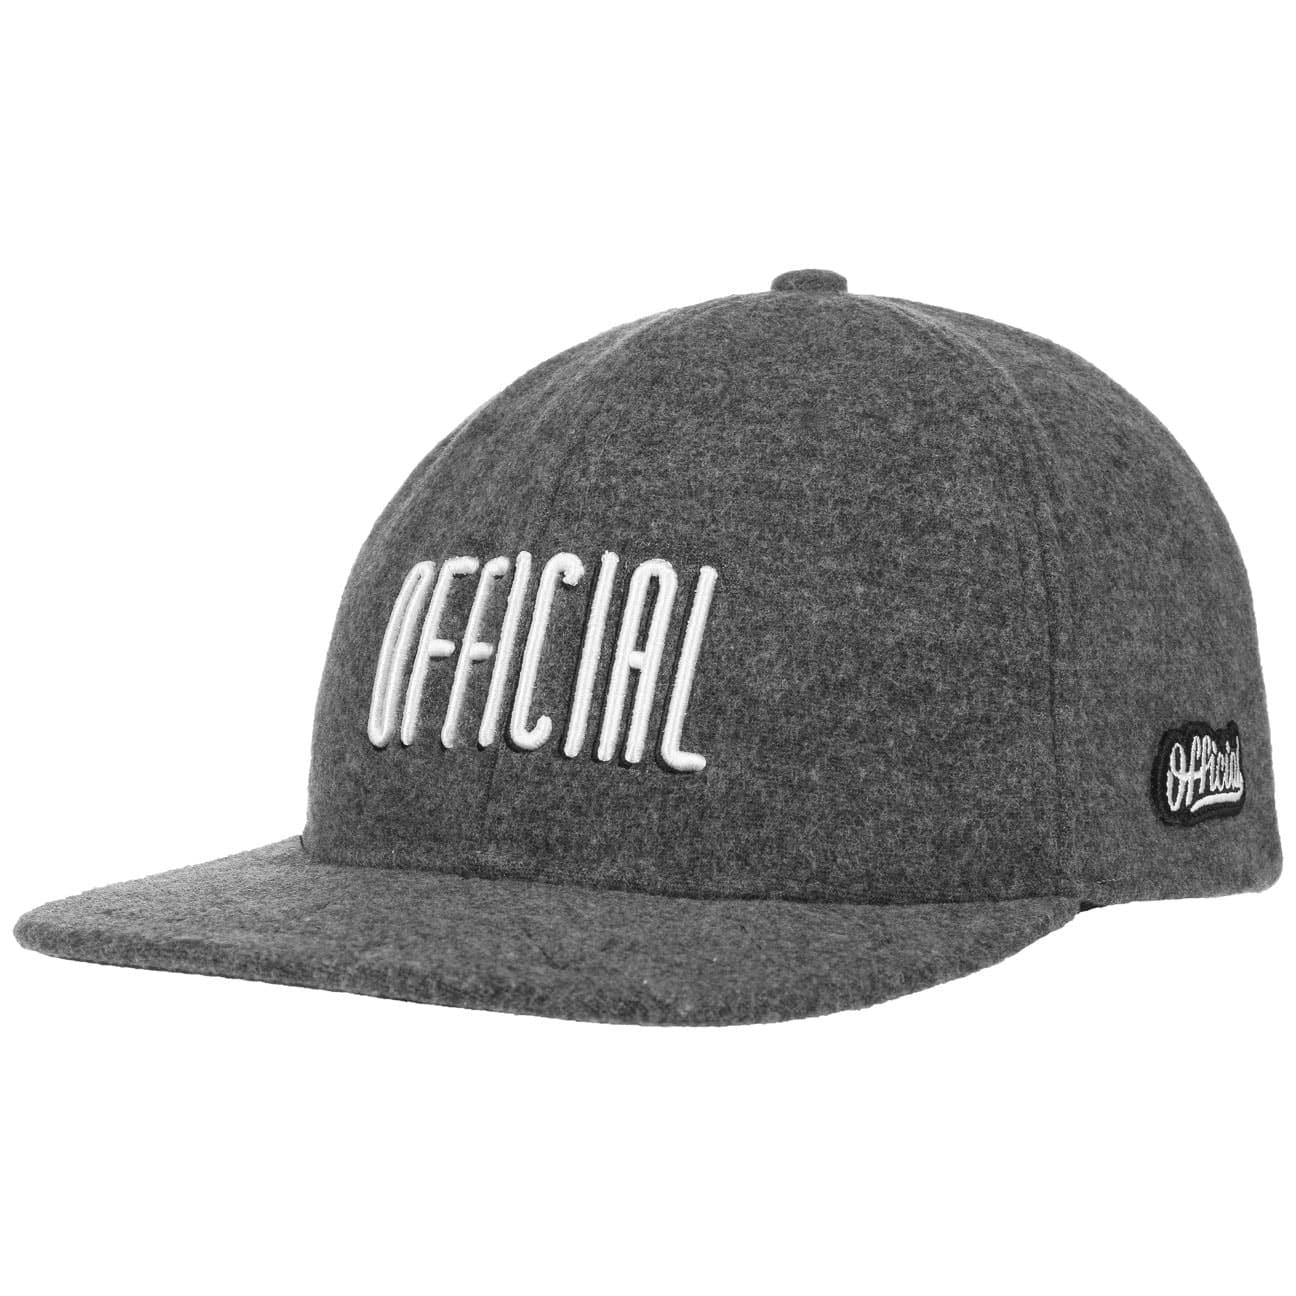 Casquette Fleece by Official Headwear  baseball cap